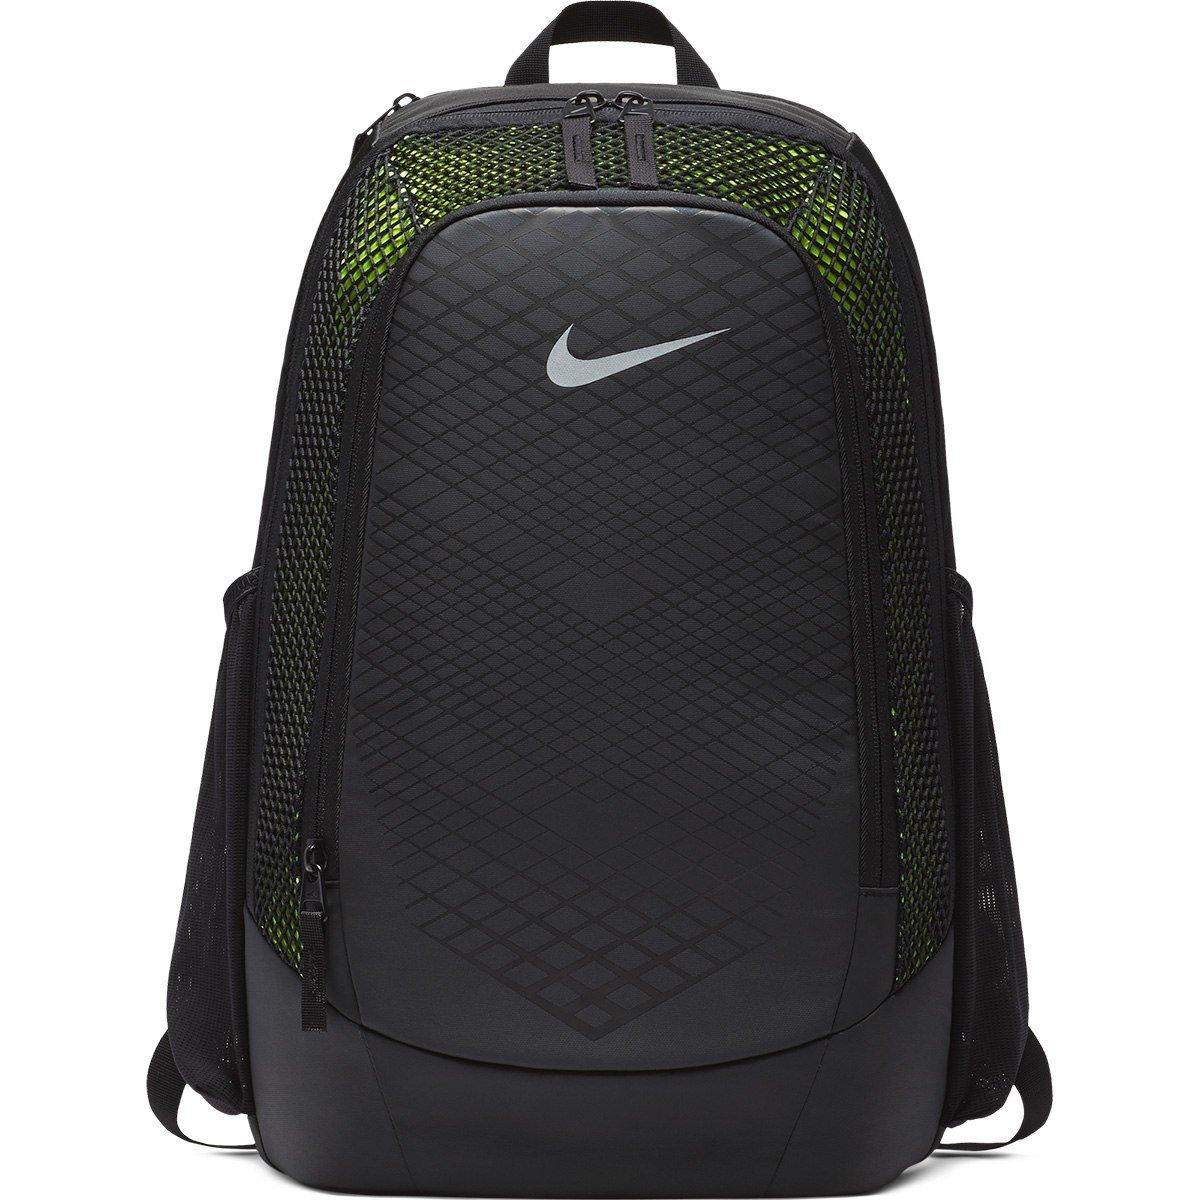 2a2b4a324c5c0 Mochila Nike Vapor Speed   Preto/verde Limao   Coutope